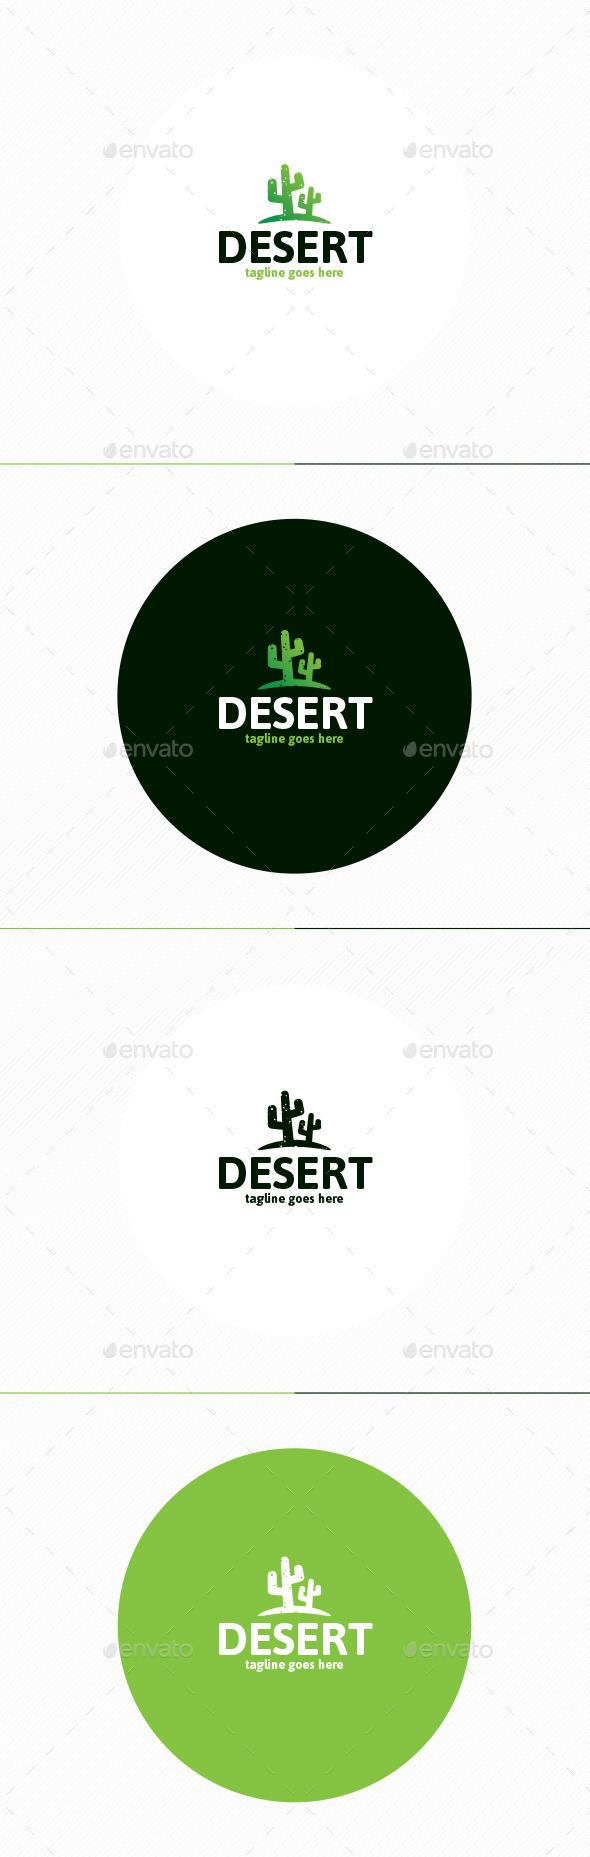 GraphicRiver Desert Logo 11810406